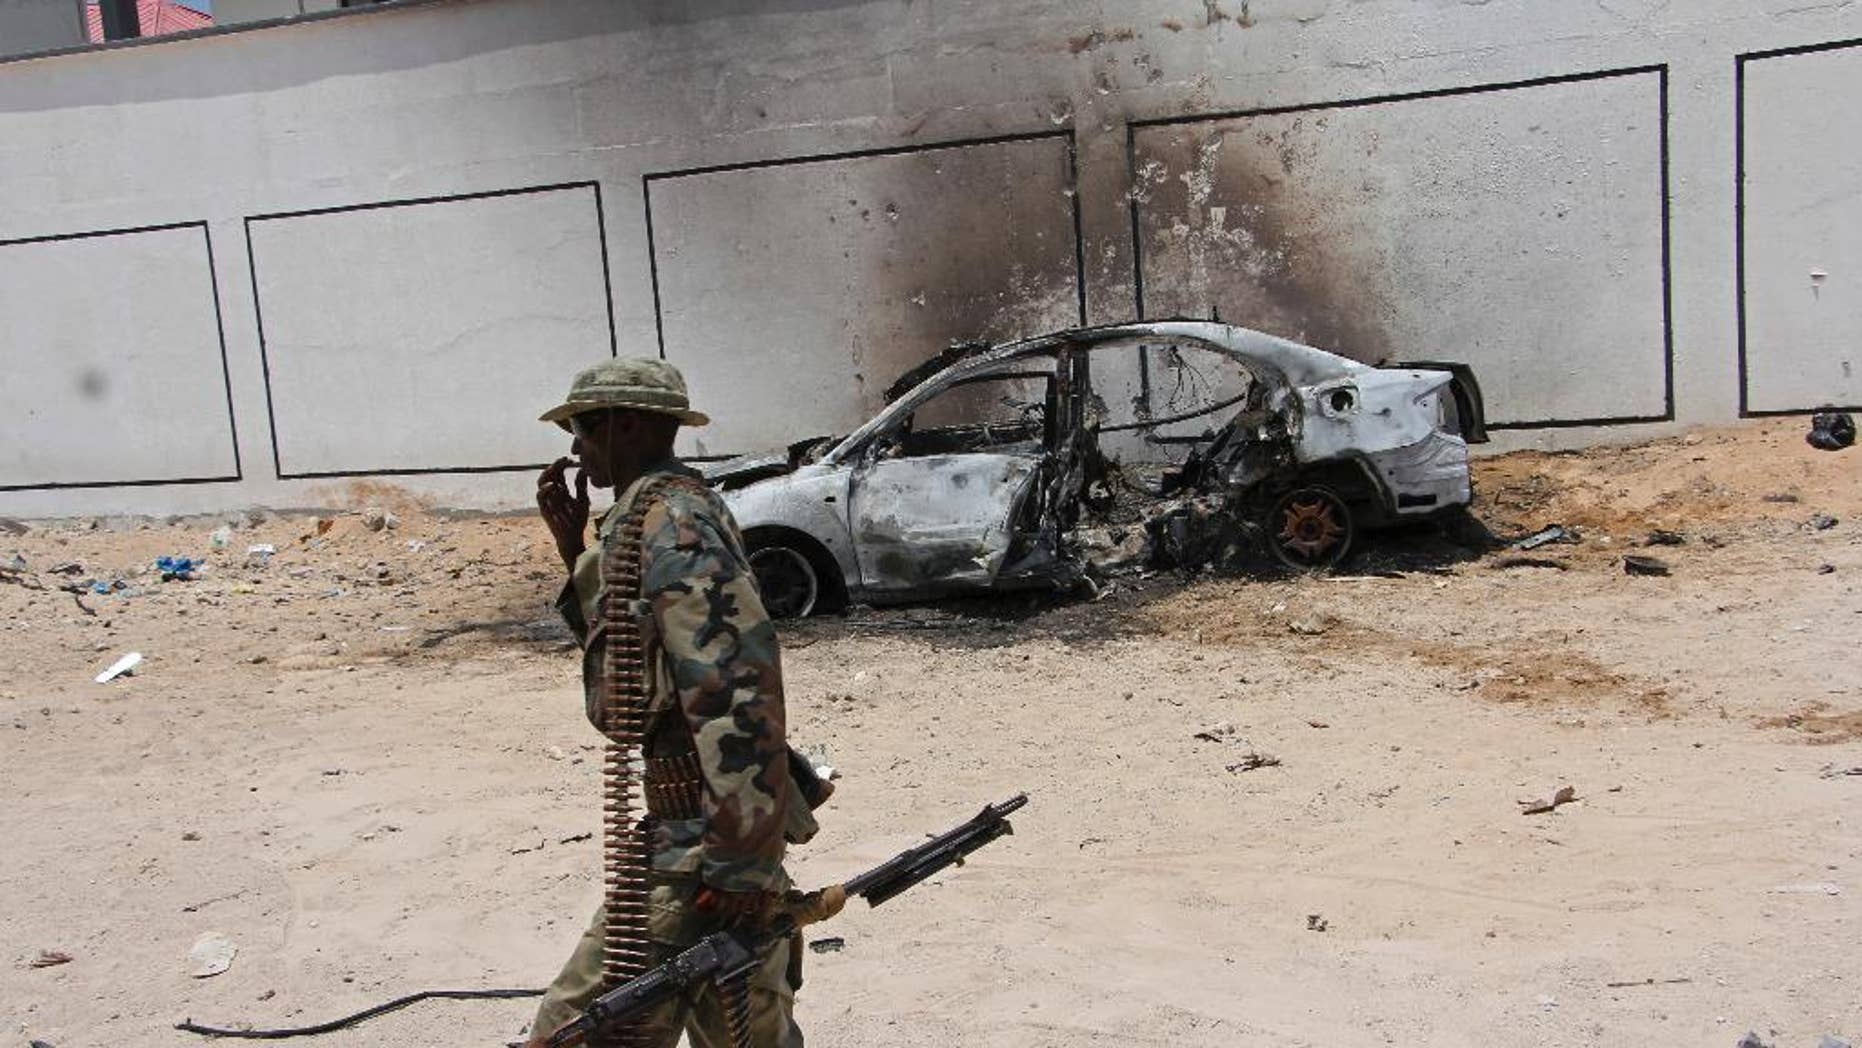 A Somali soldier walks near the wreckage of a car bomb blast near Aden Abdule international airport in Mogadishu, Somalia, Sunday, April, 16, 2017. A Somali police officer says a car bomb detonated near the Somali capital's airport. (AP Photo/Farah Abdi Warsameh)